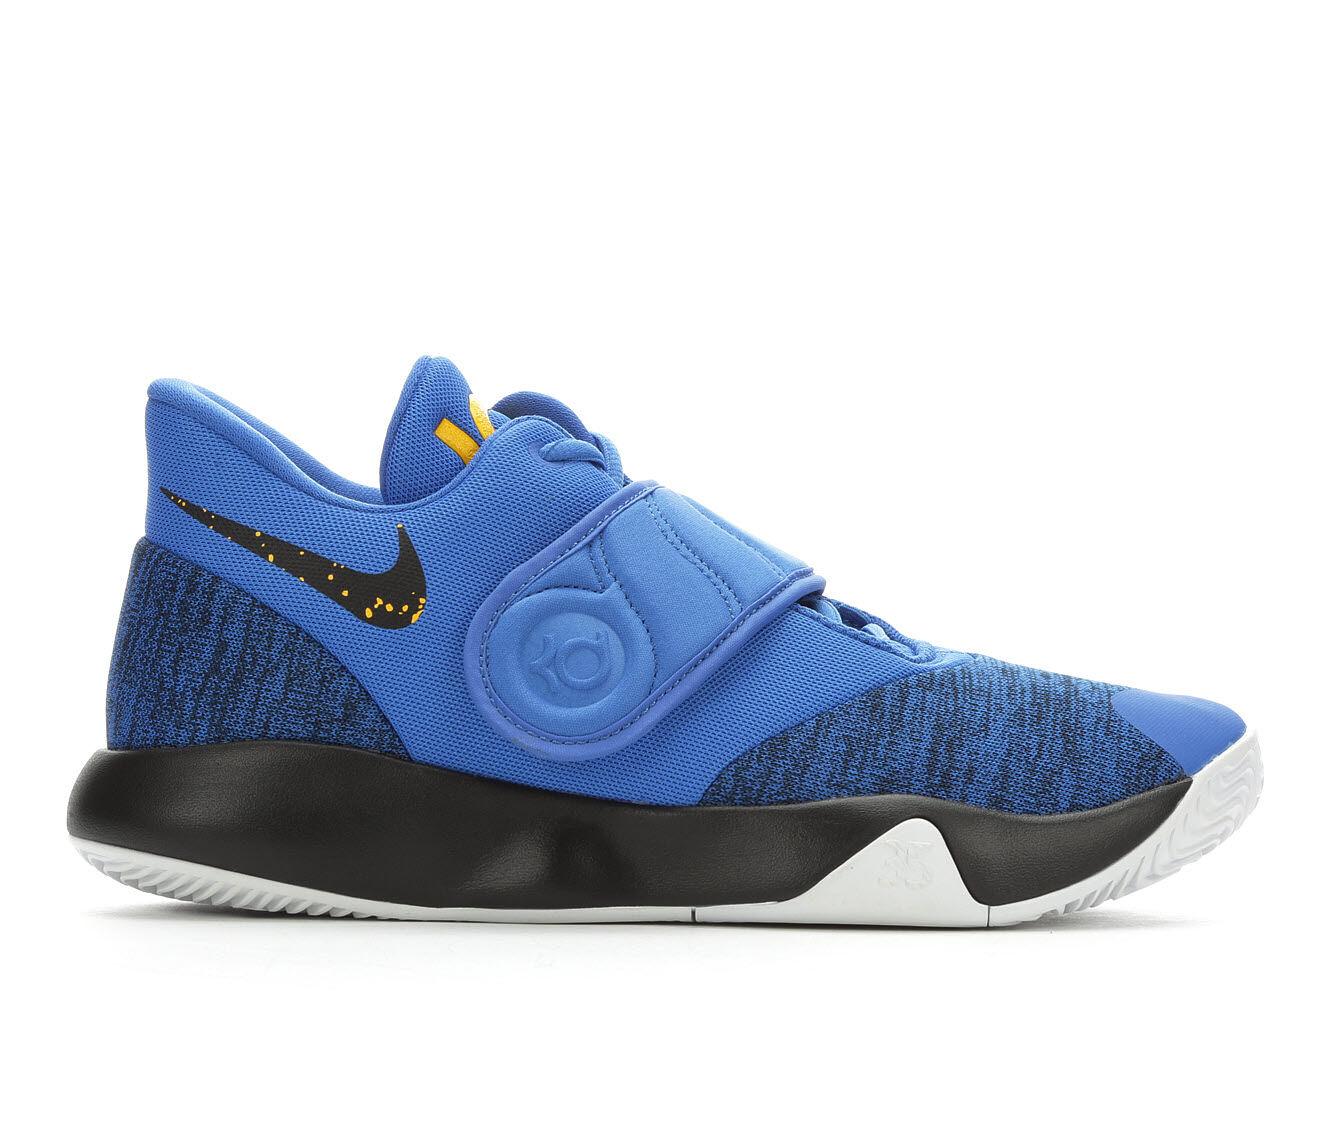 the best attitude df085 82a93 ... germany nike kd trey 5 vi high top basketball shoes. carousel controls  previous dc9e9 c6ec8